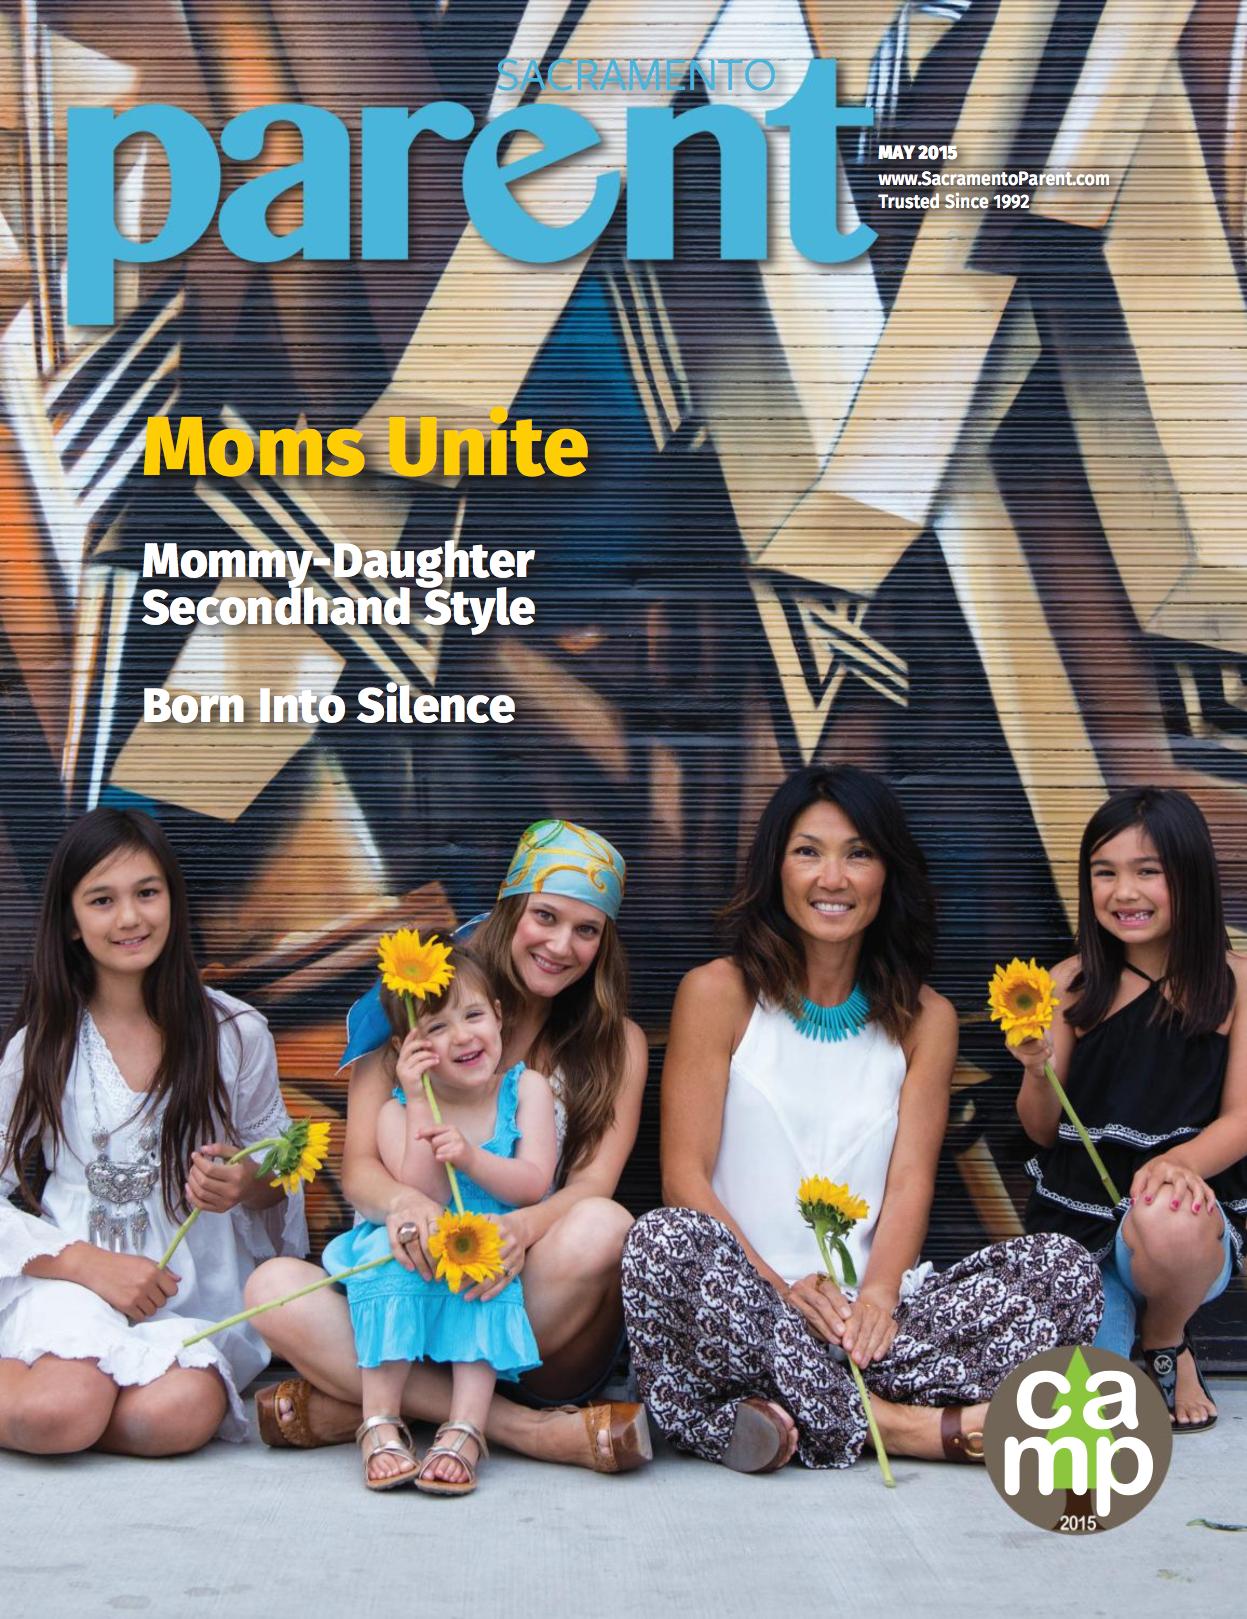 Sacramento Parent Cover - May 2015.png